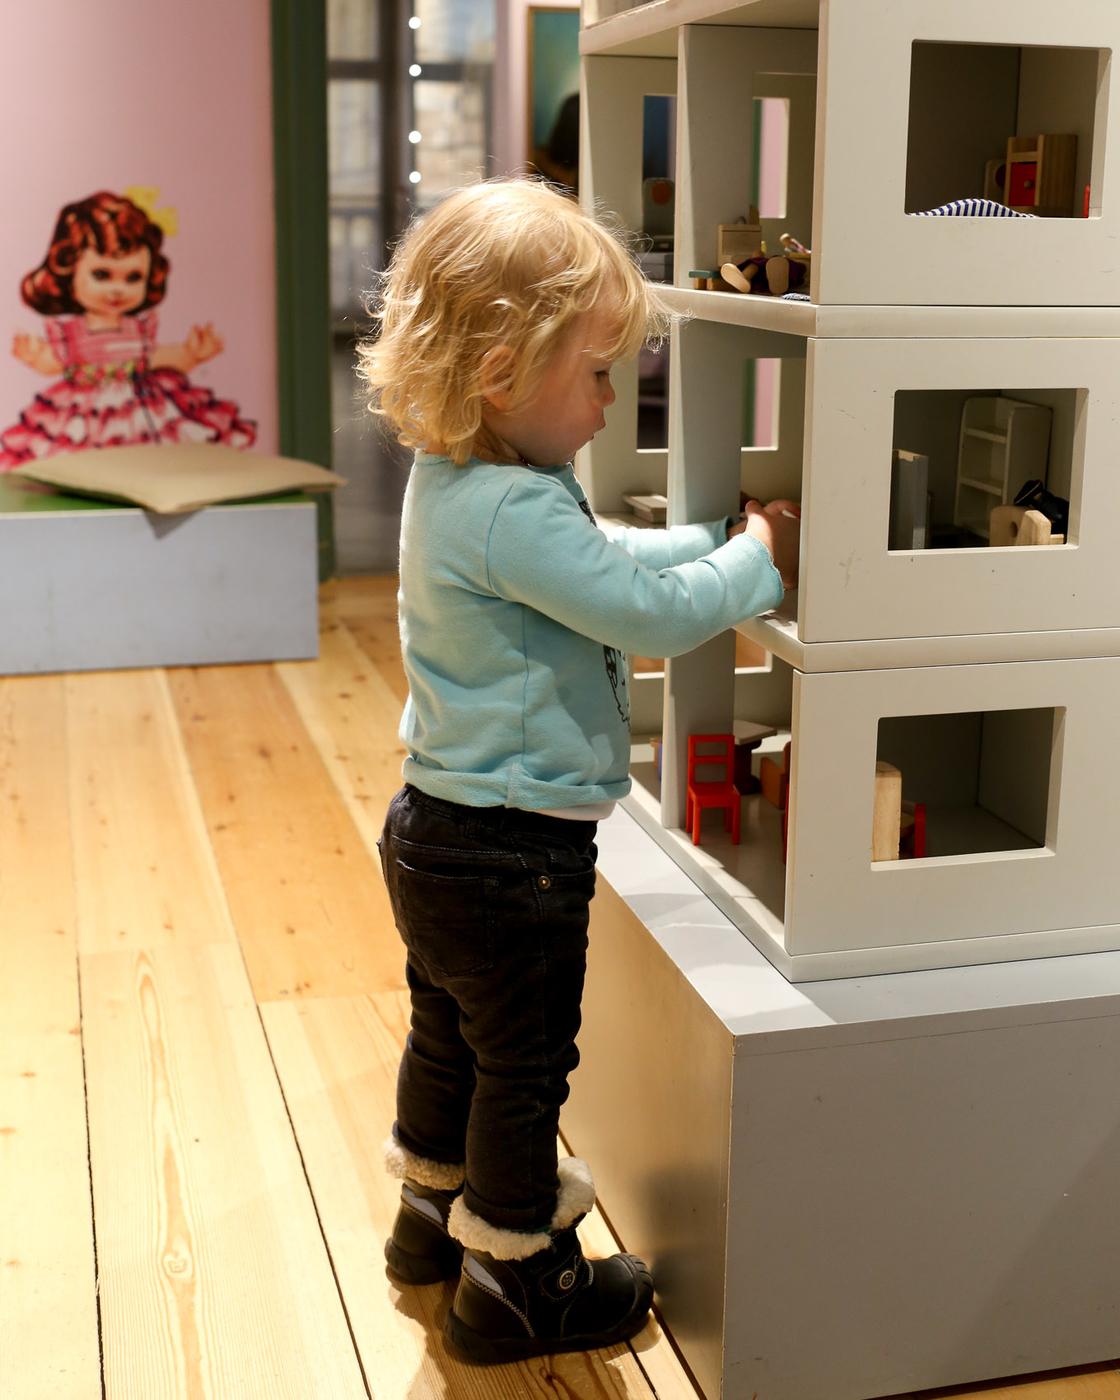 Helsingin kaupunginmuseo - Lasten kaupunki - 09.jpg